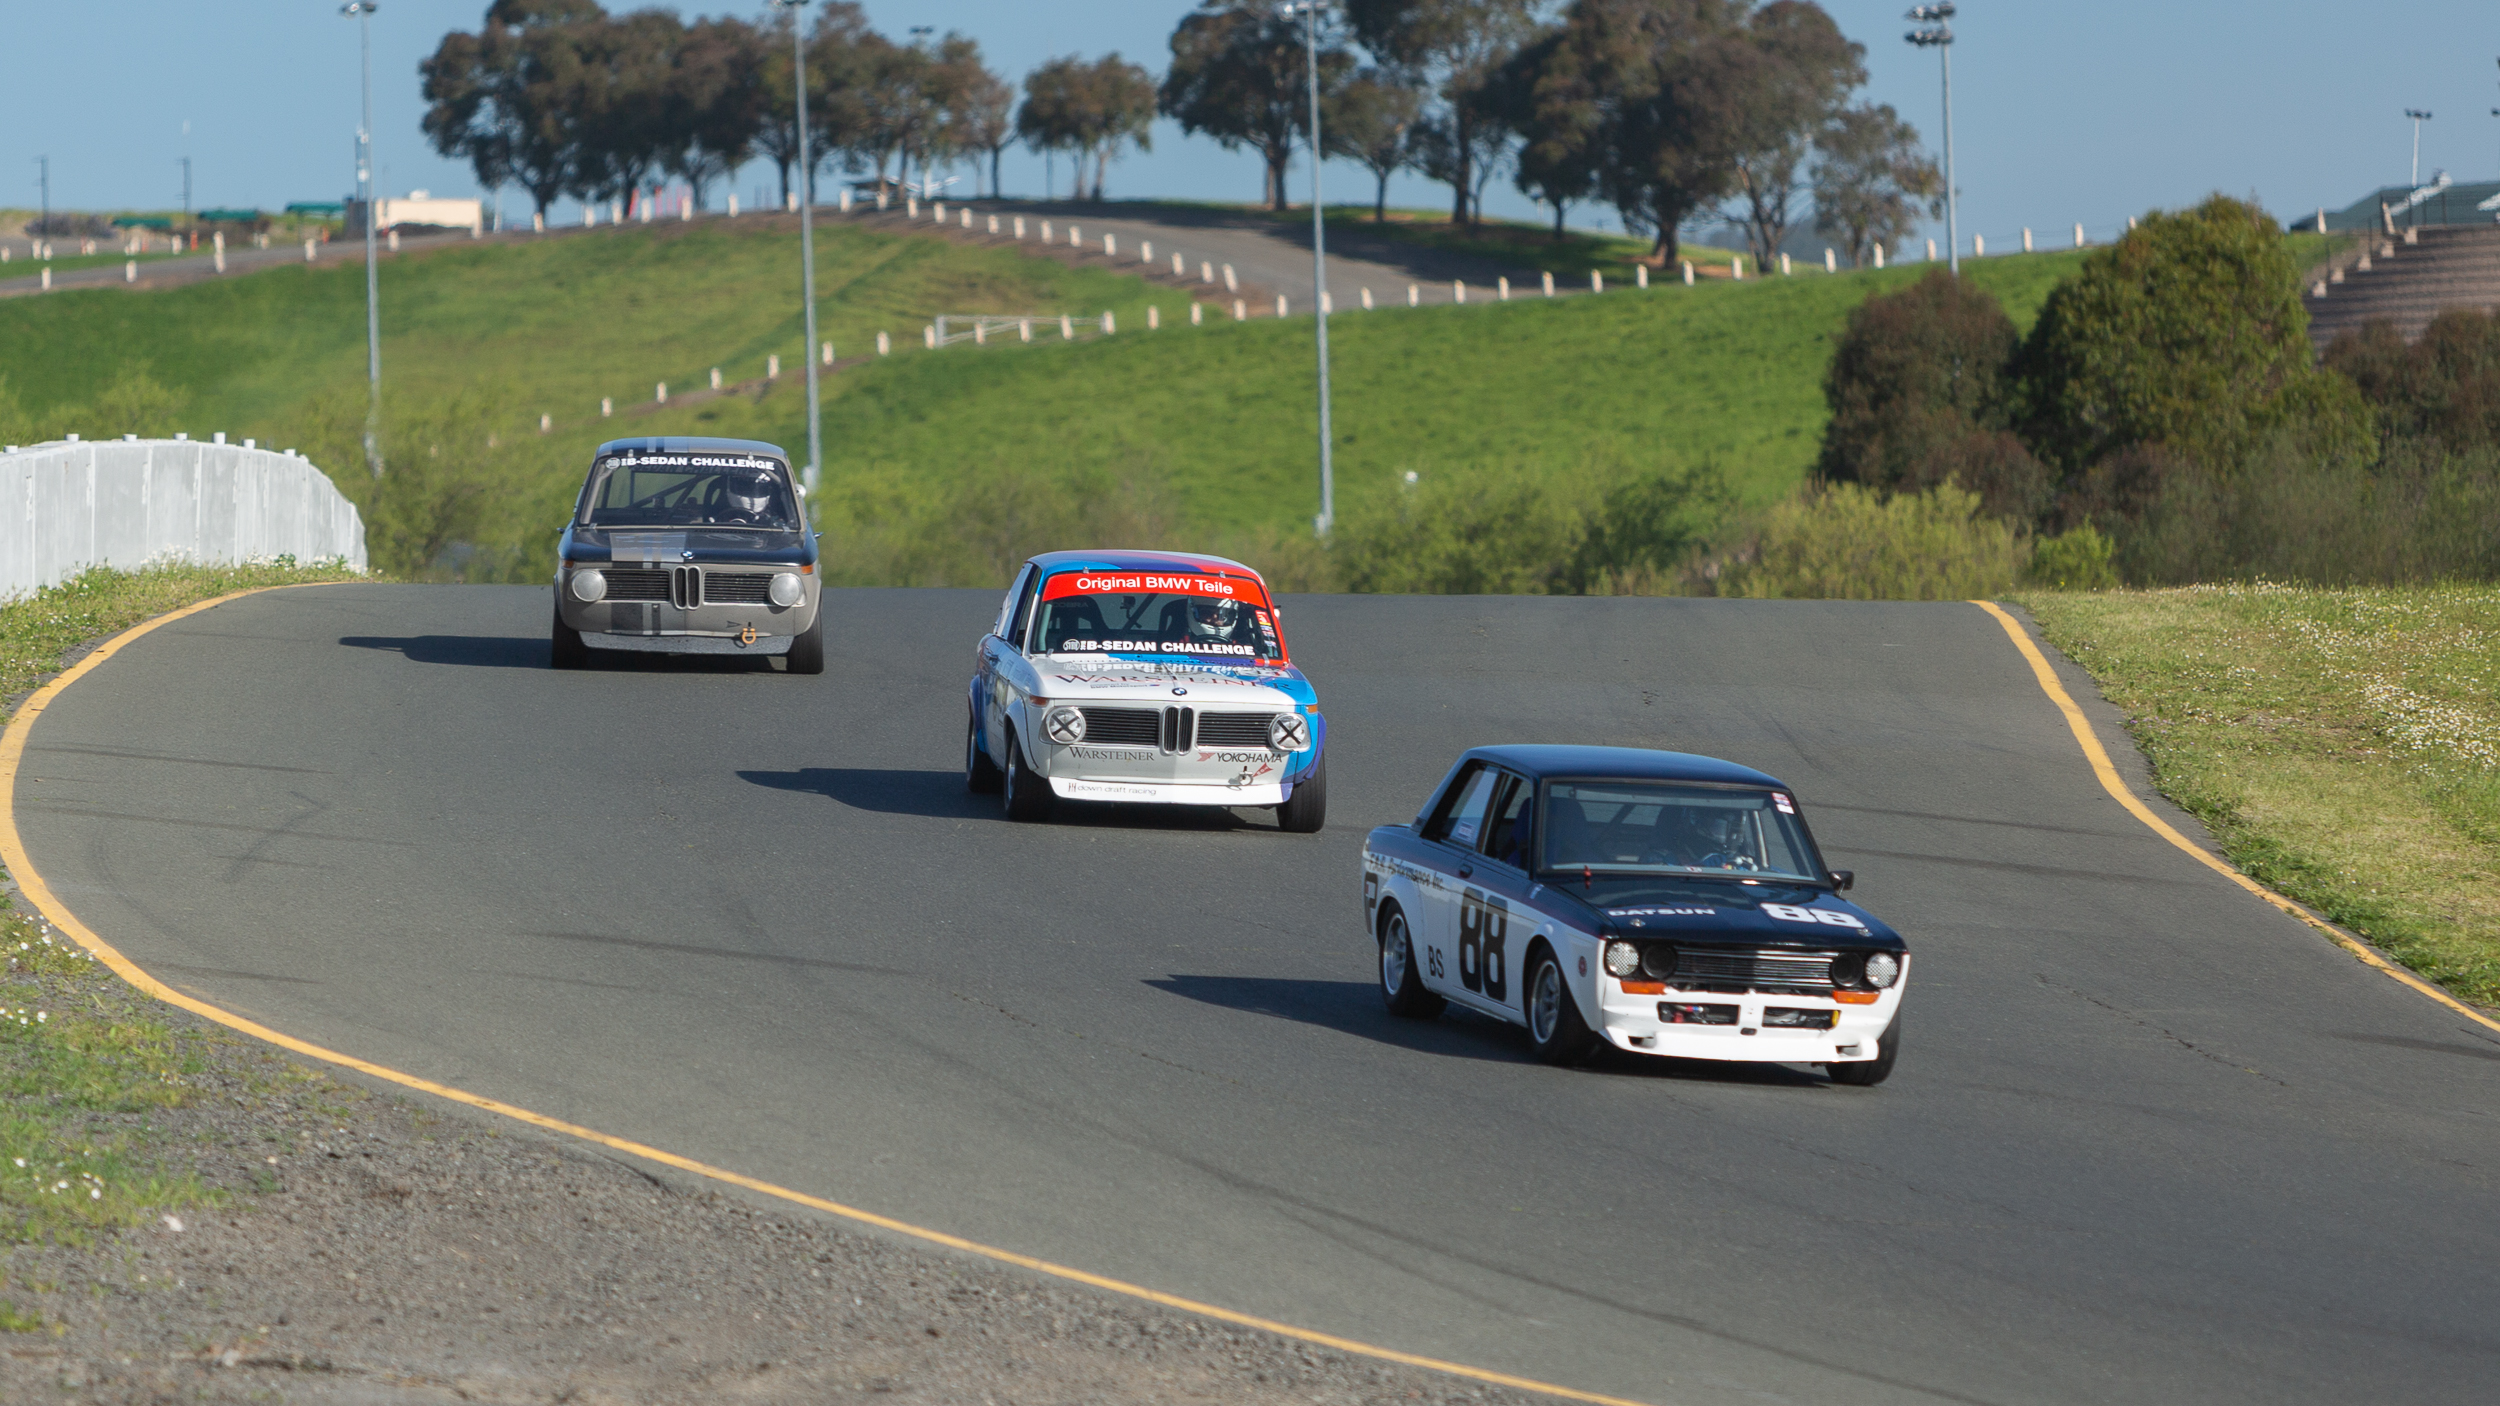 Battle of the B Sedans during the John Morton Cup race